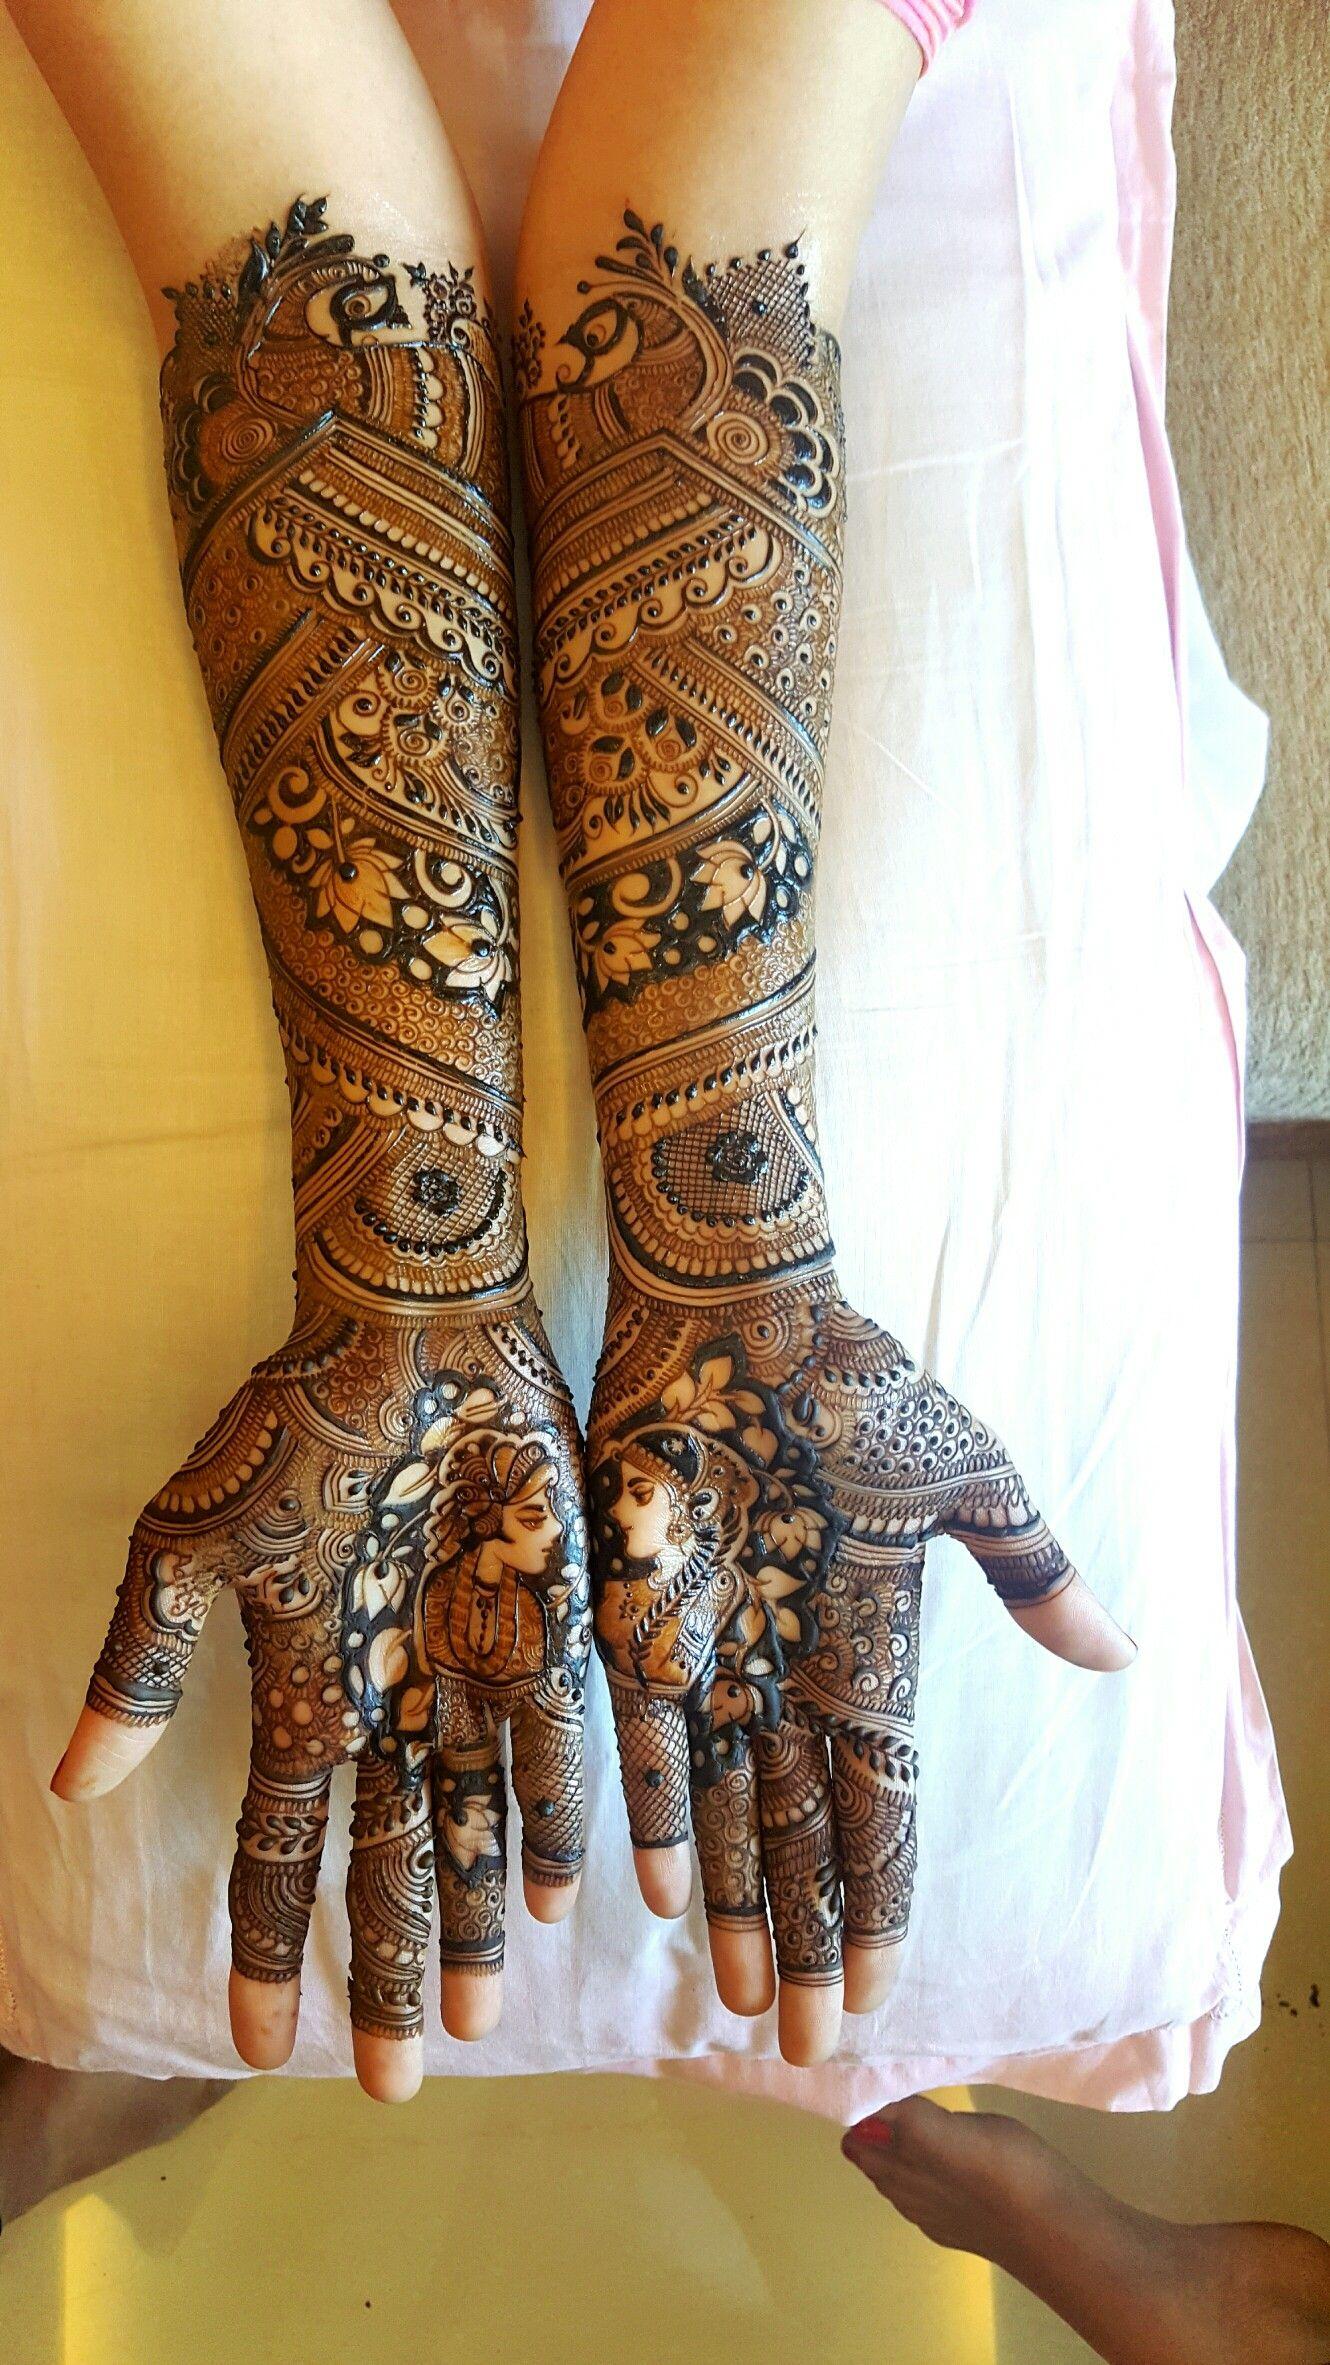 Mehndi Henna Wedding : Pin by sap on henna pinterest mehendi mehndi and hennas